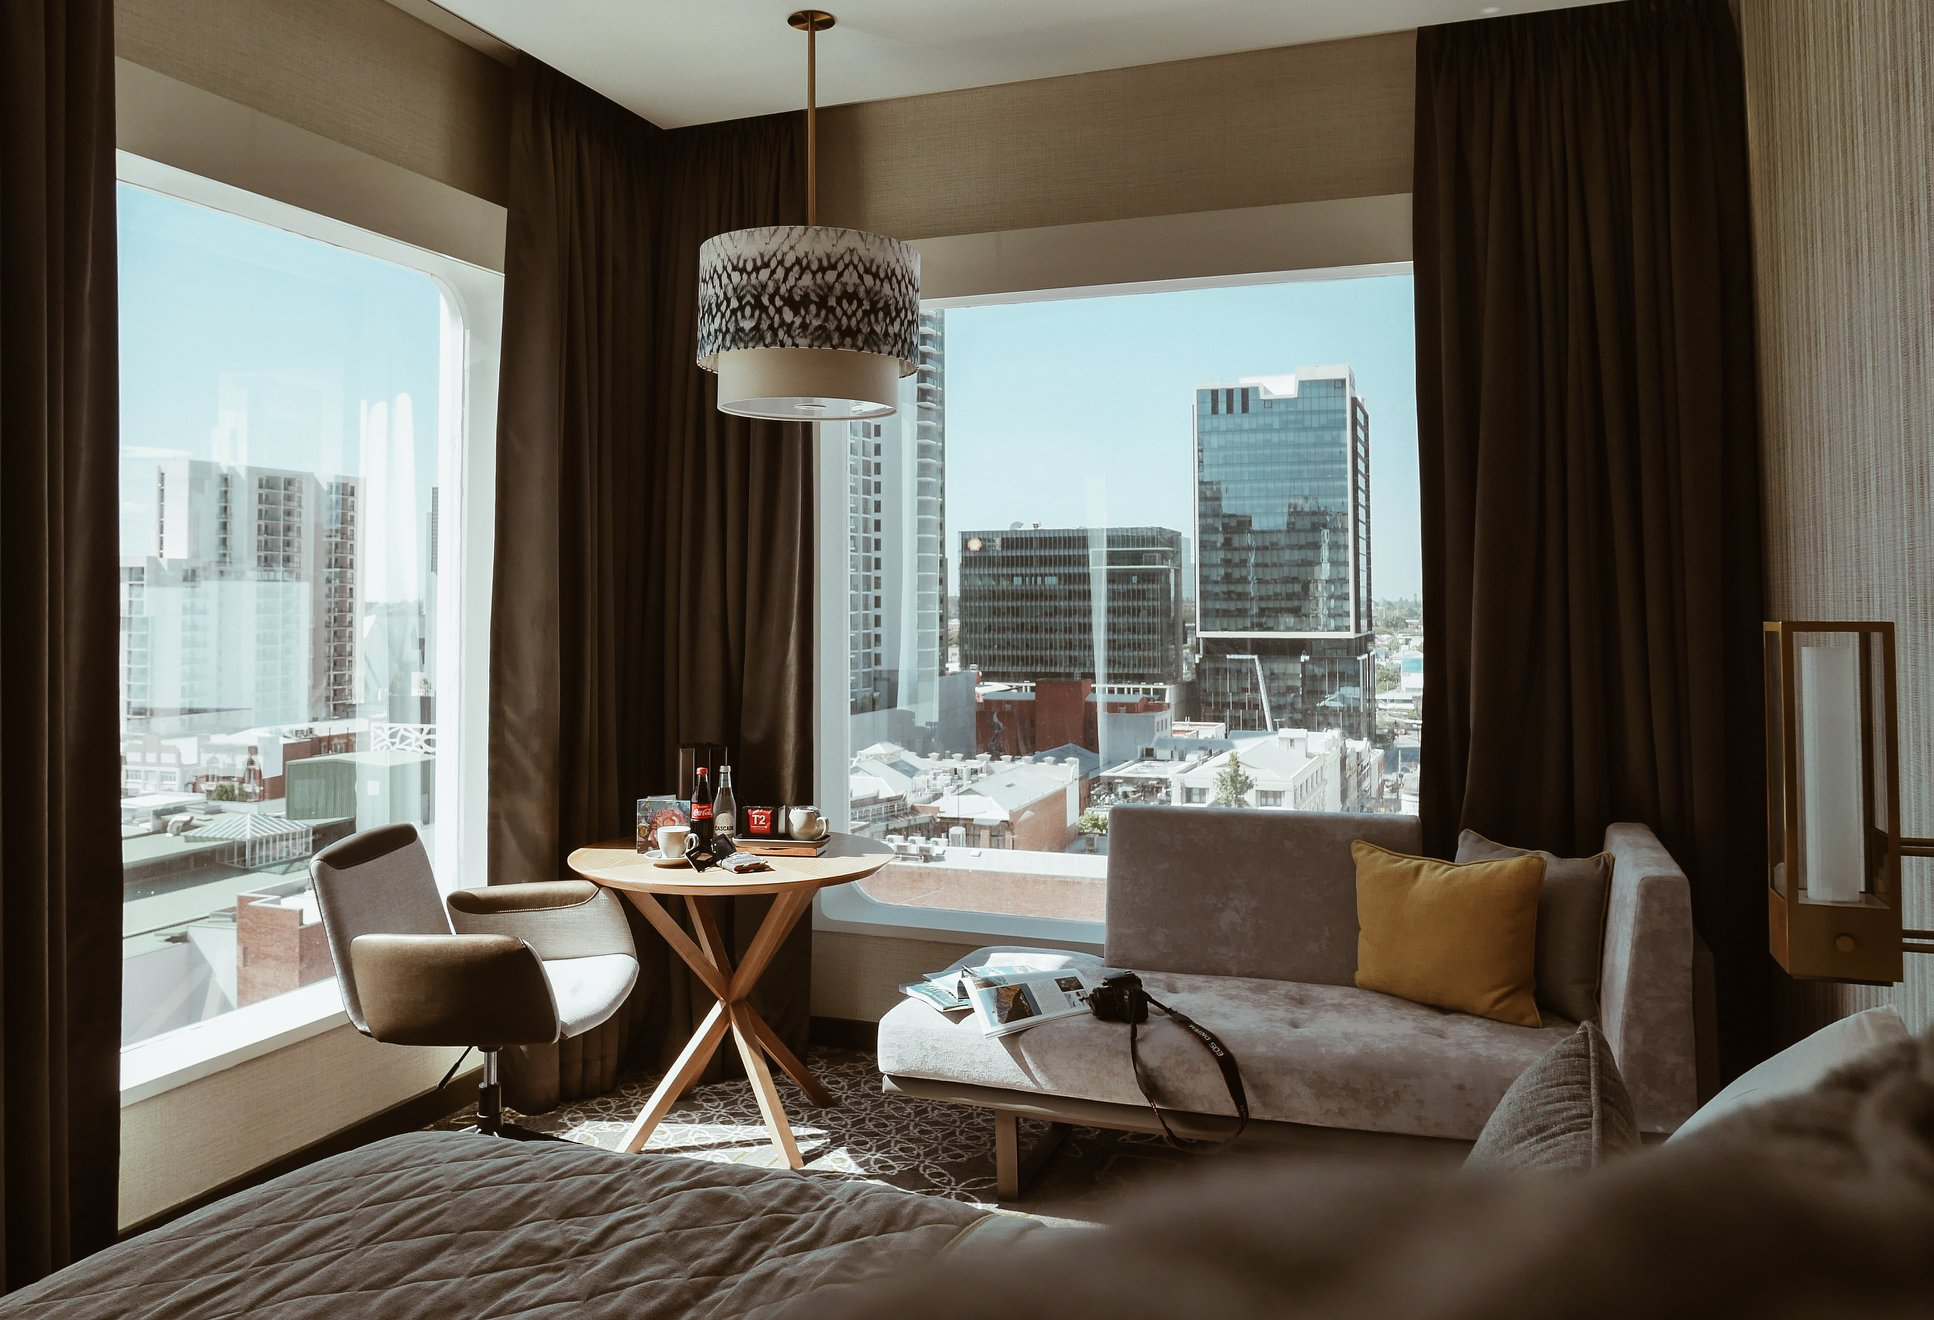 Room at the Intercontinental Perth